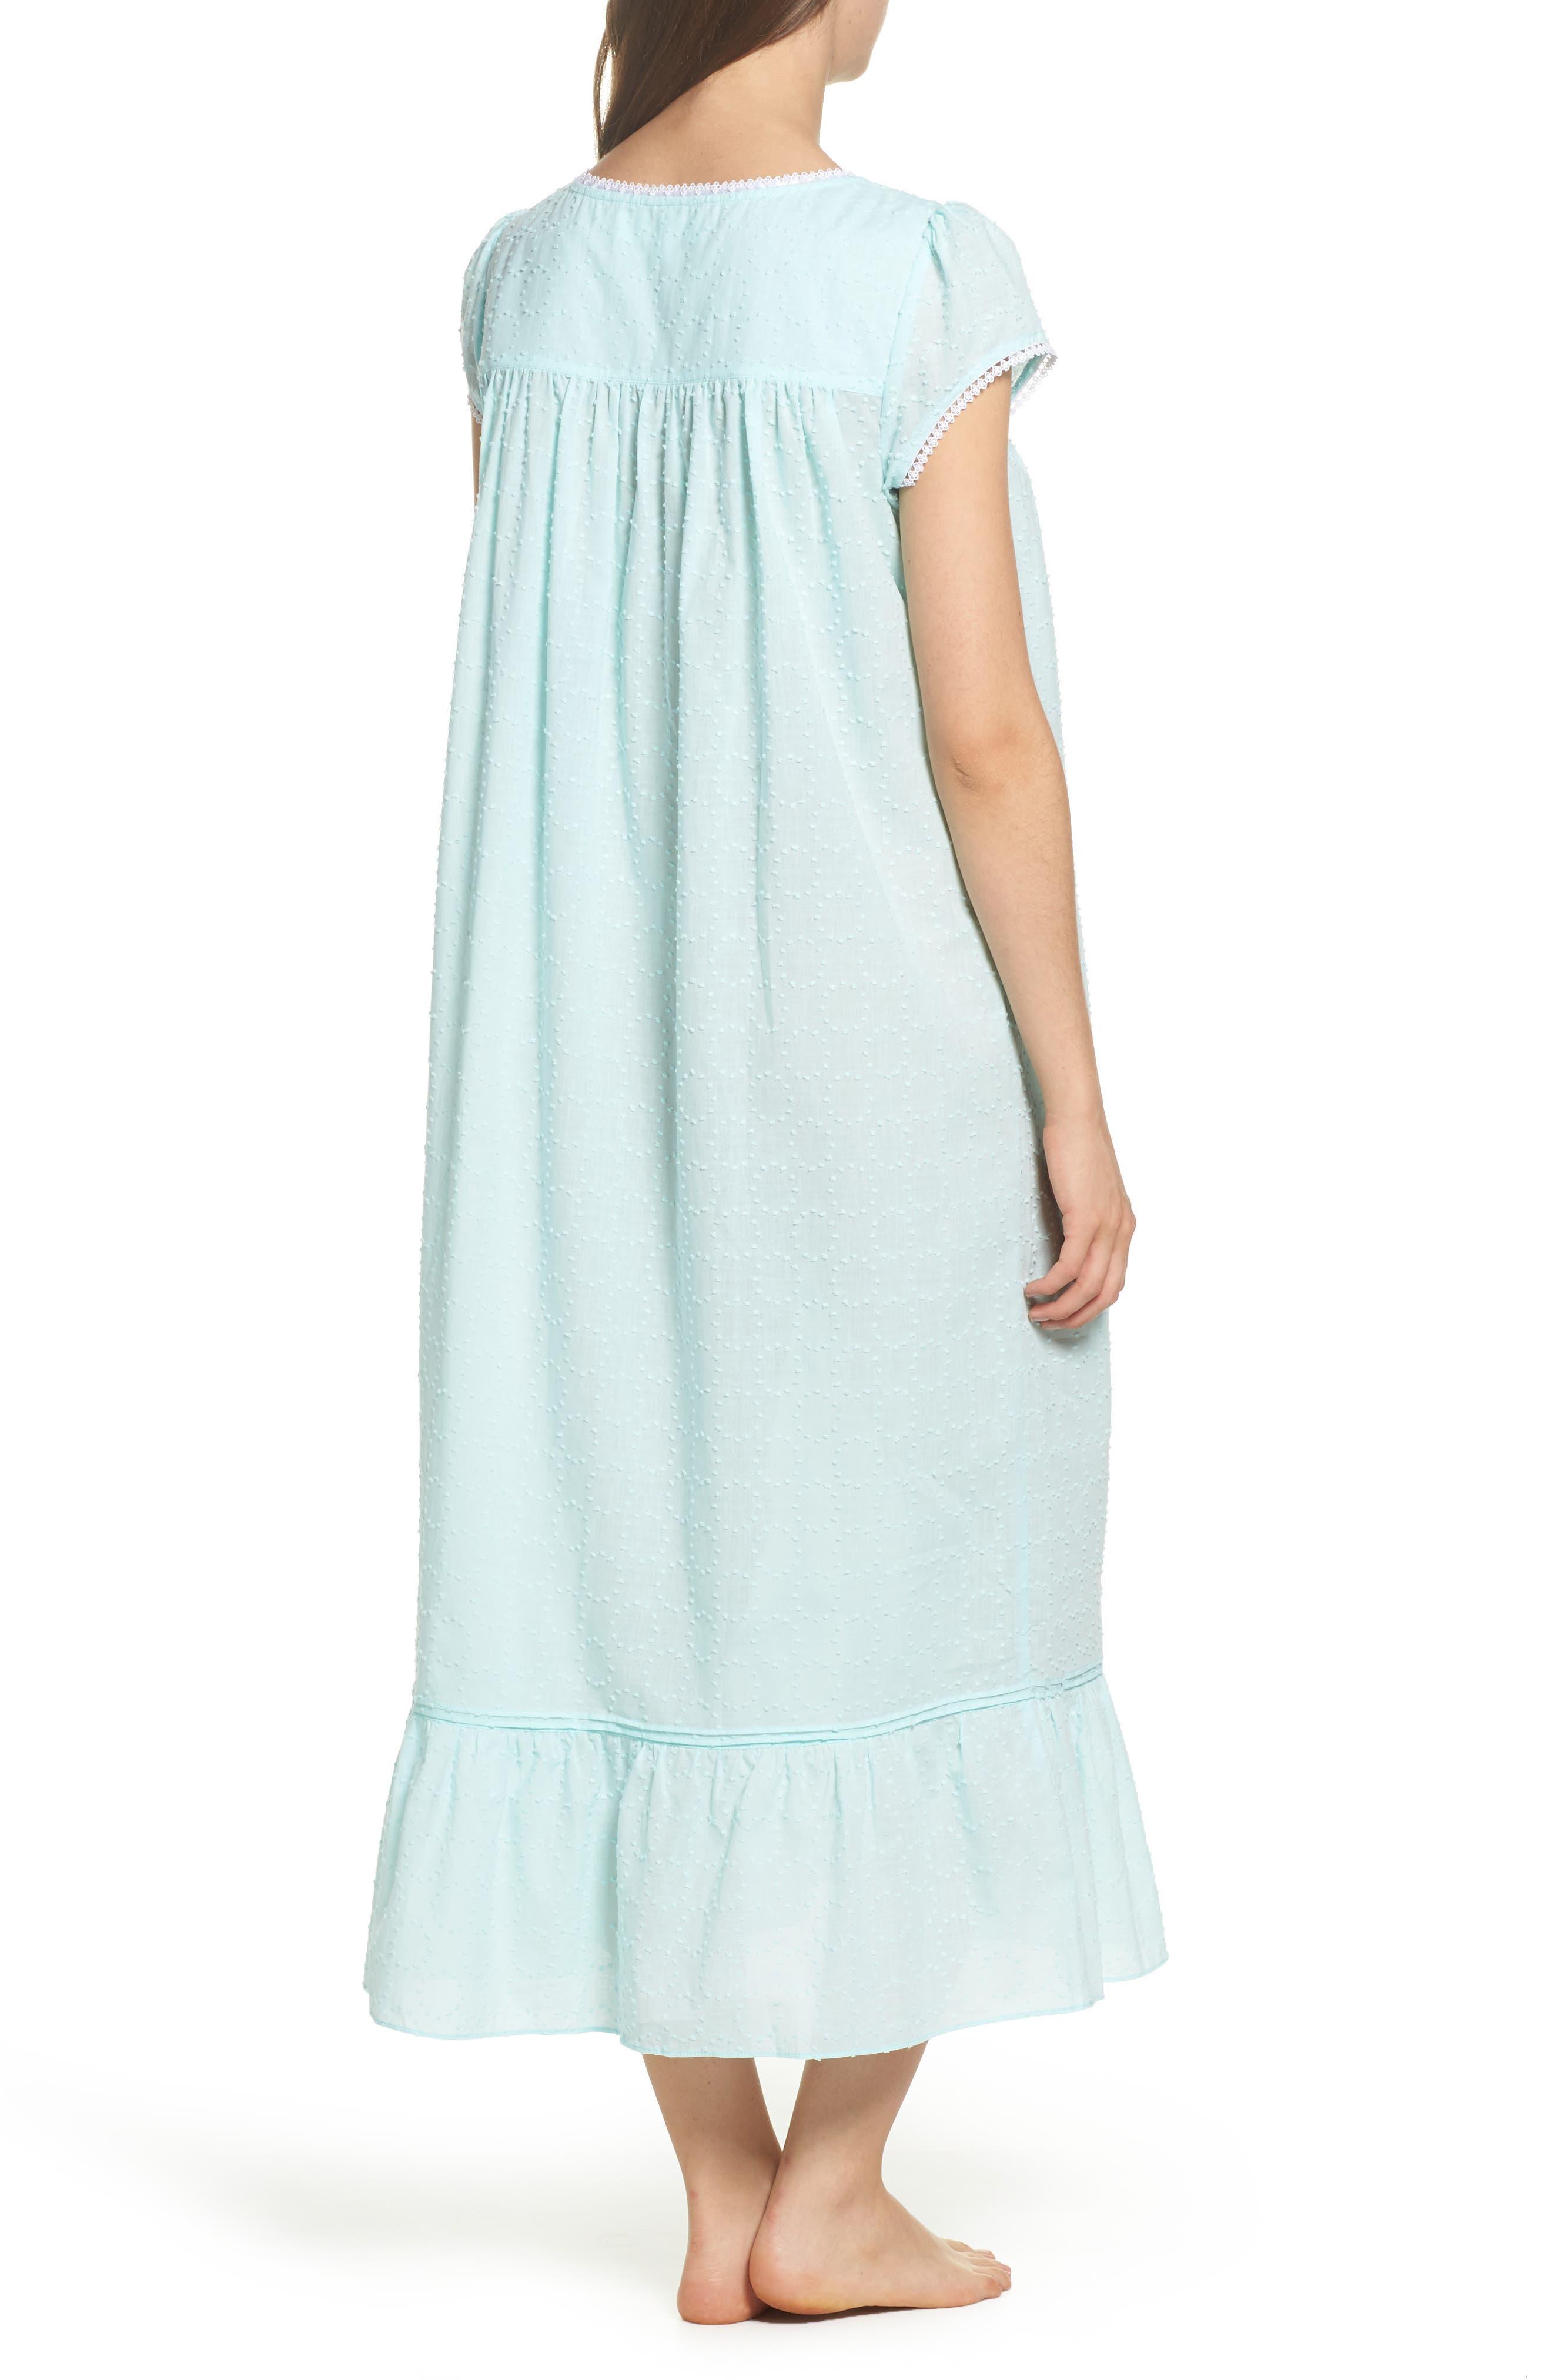 Cotton Ballet Nightgown,                             Alternate thumbnail 2, color,                             400